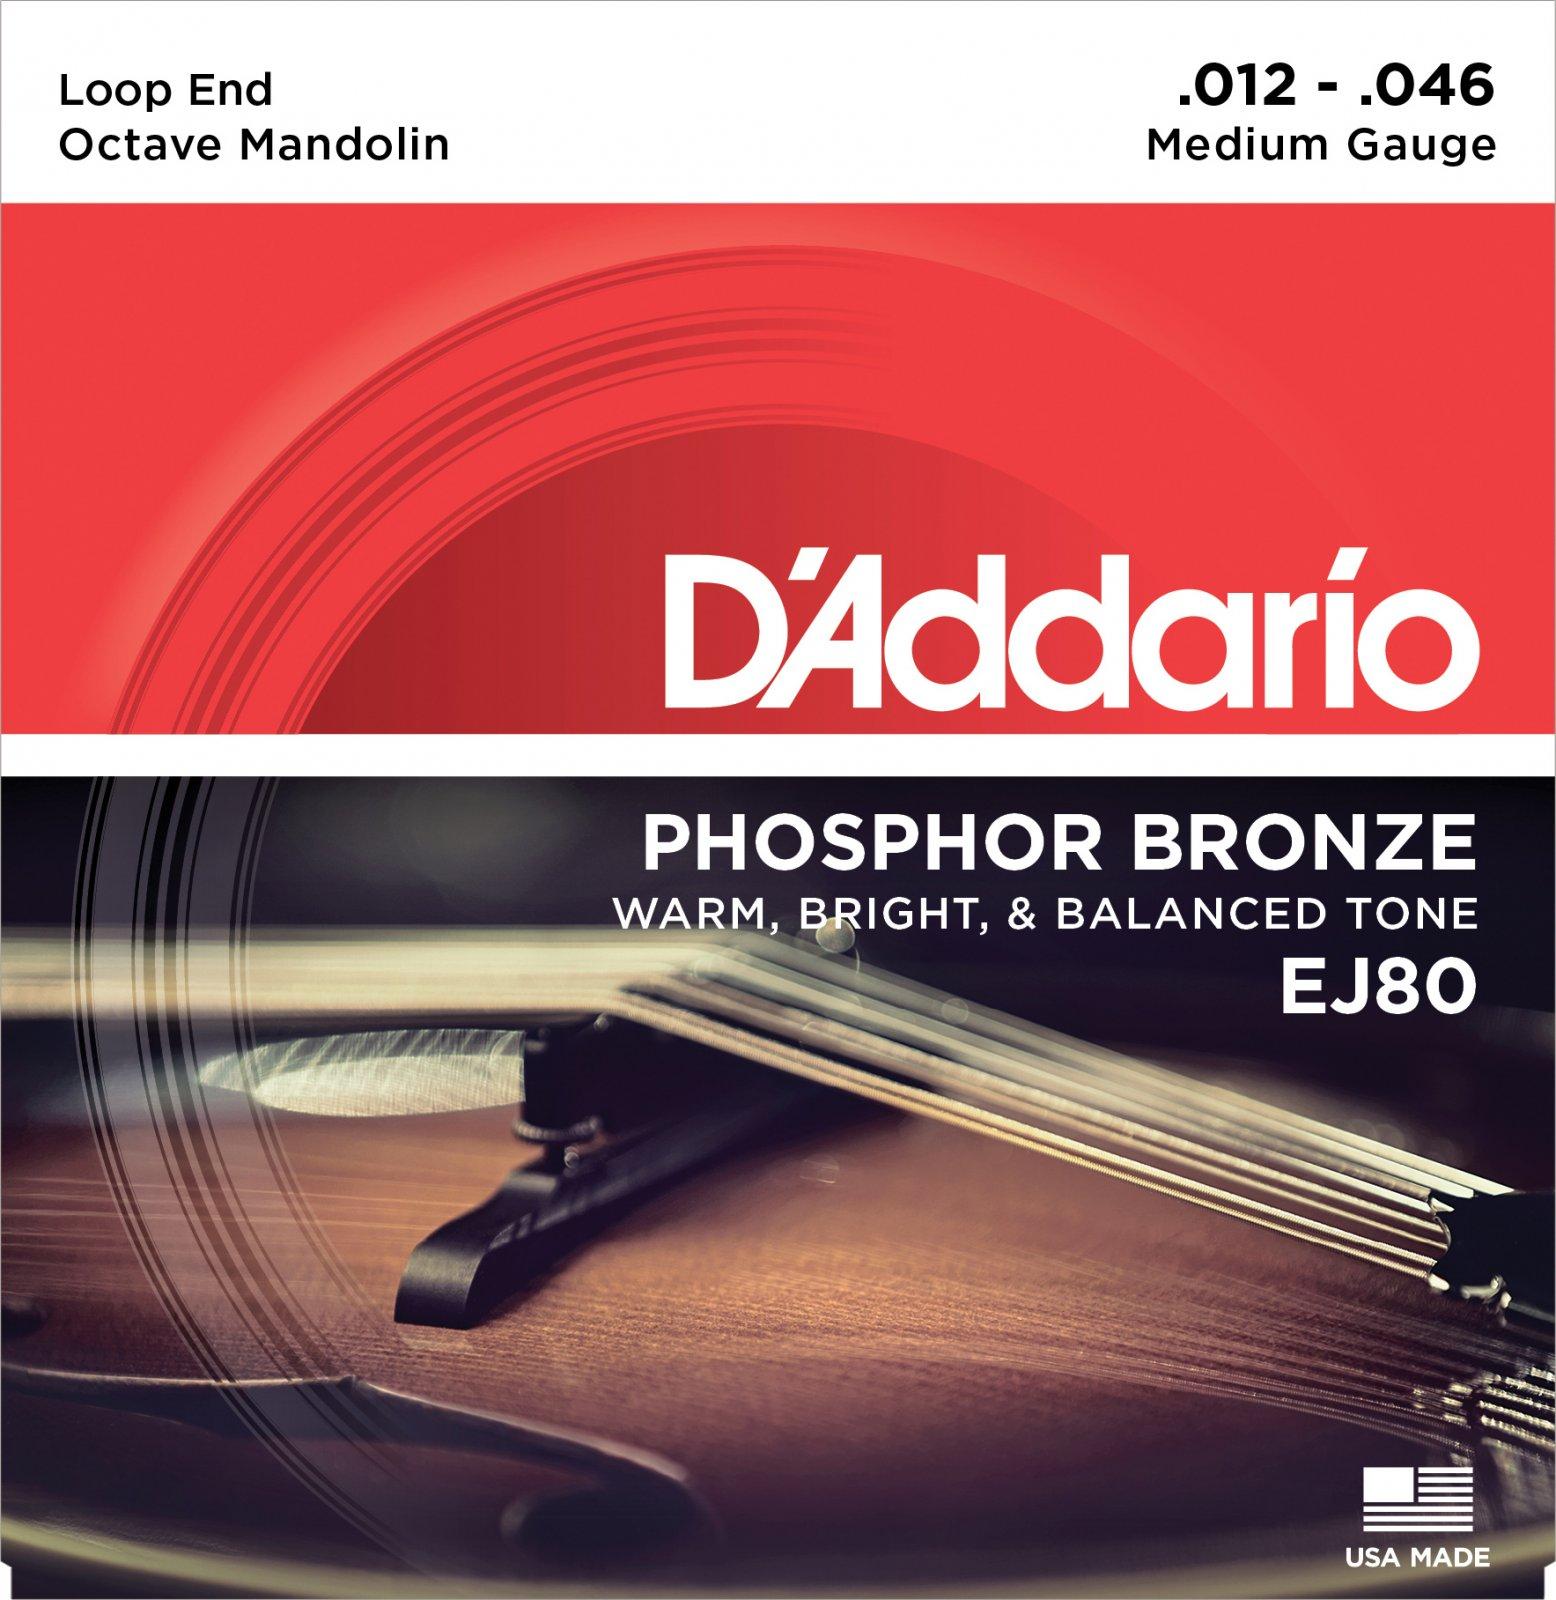 D'Addario EJ80 Phosphor Bronze Octave Mandolin Strings Medium